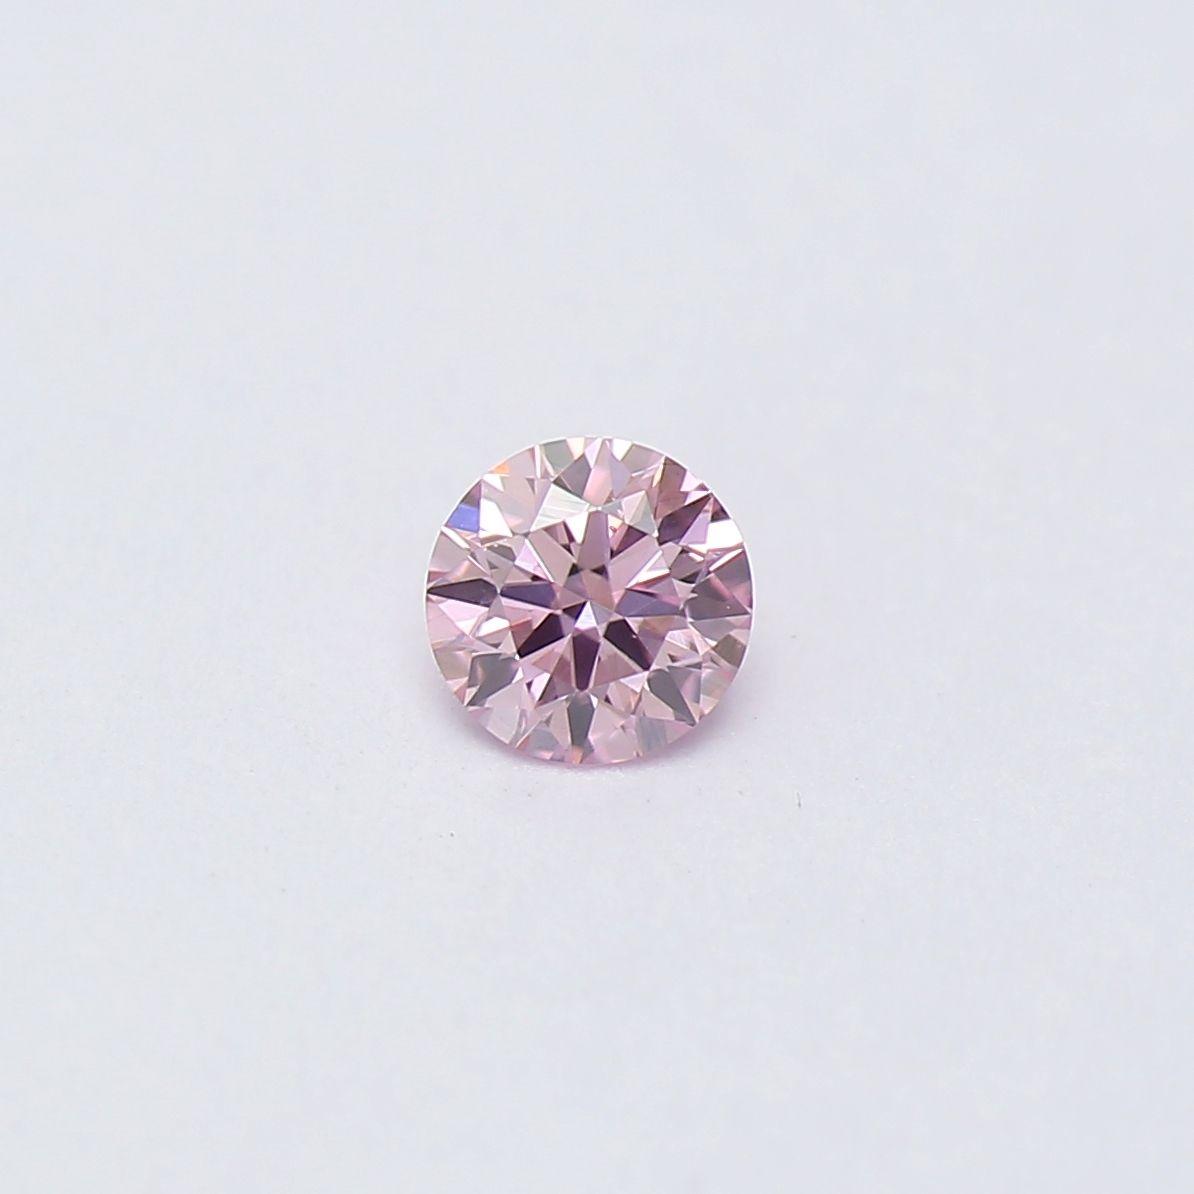 39aafbfae Round 0.08 6PP Argyle Pink Diamond   Loose Coloured Diamonds ...